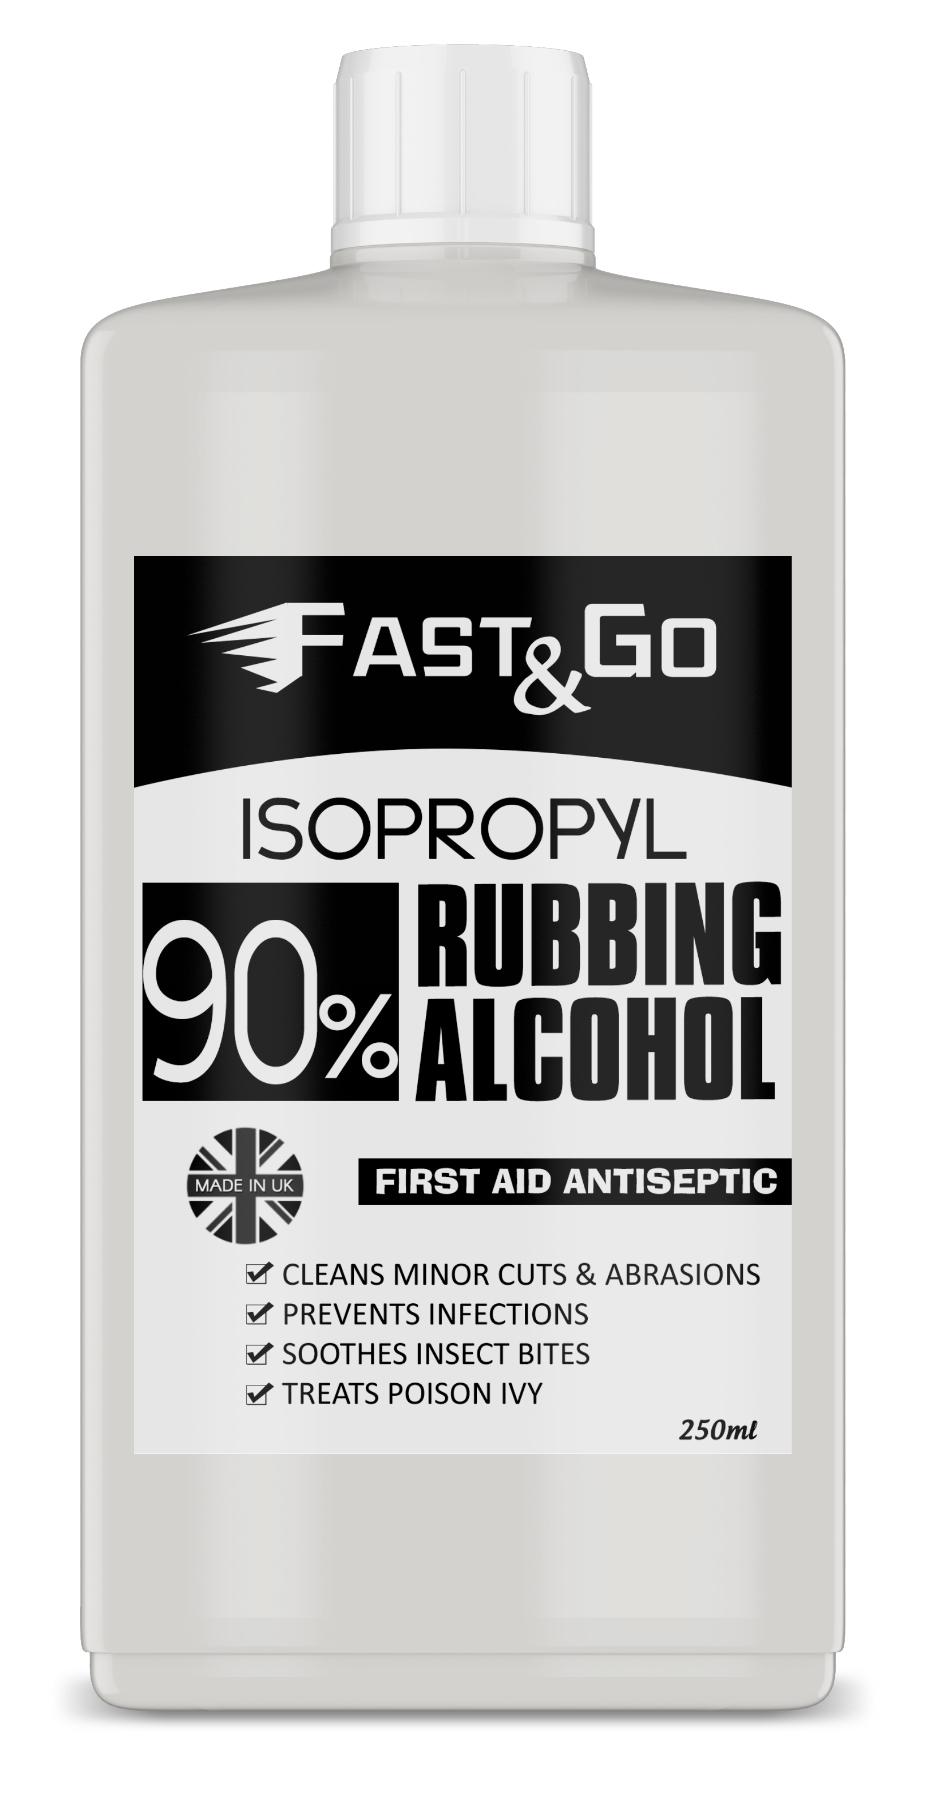 Fast Aid Birmingham Solihull: Fast & Go Isopropyl Rubbing Alcohol 90% First Aid